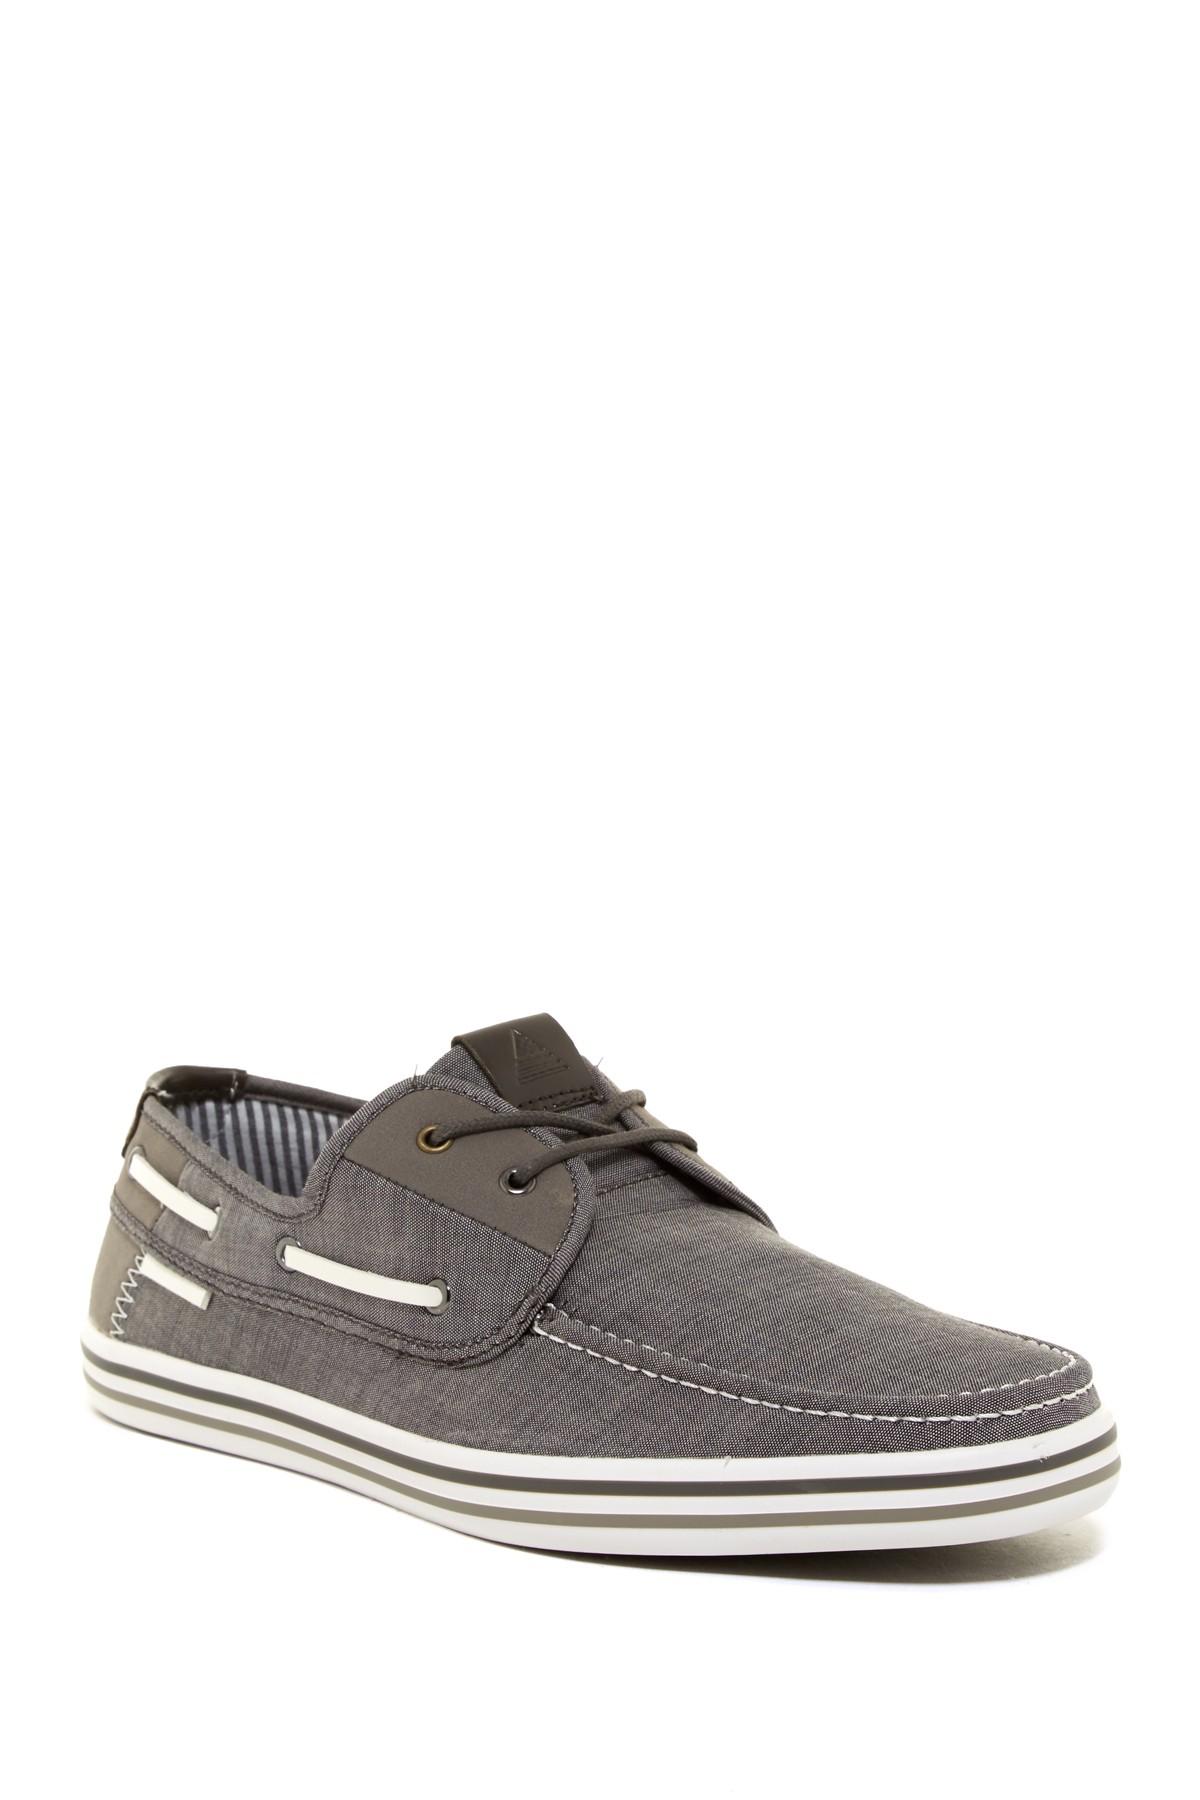 aldo droani boat shoe in gray for lyst